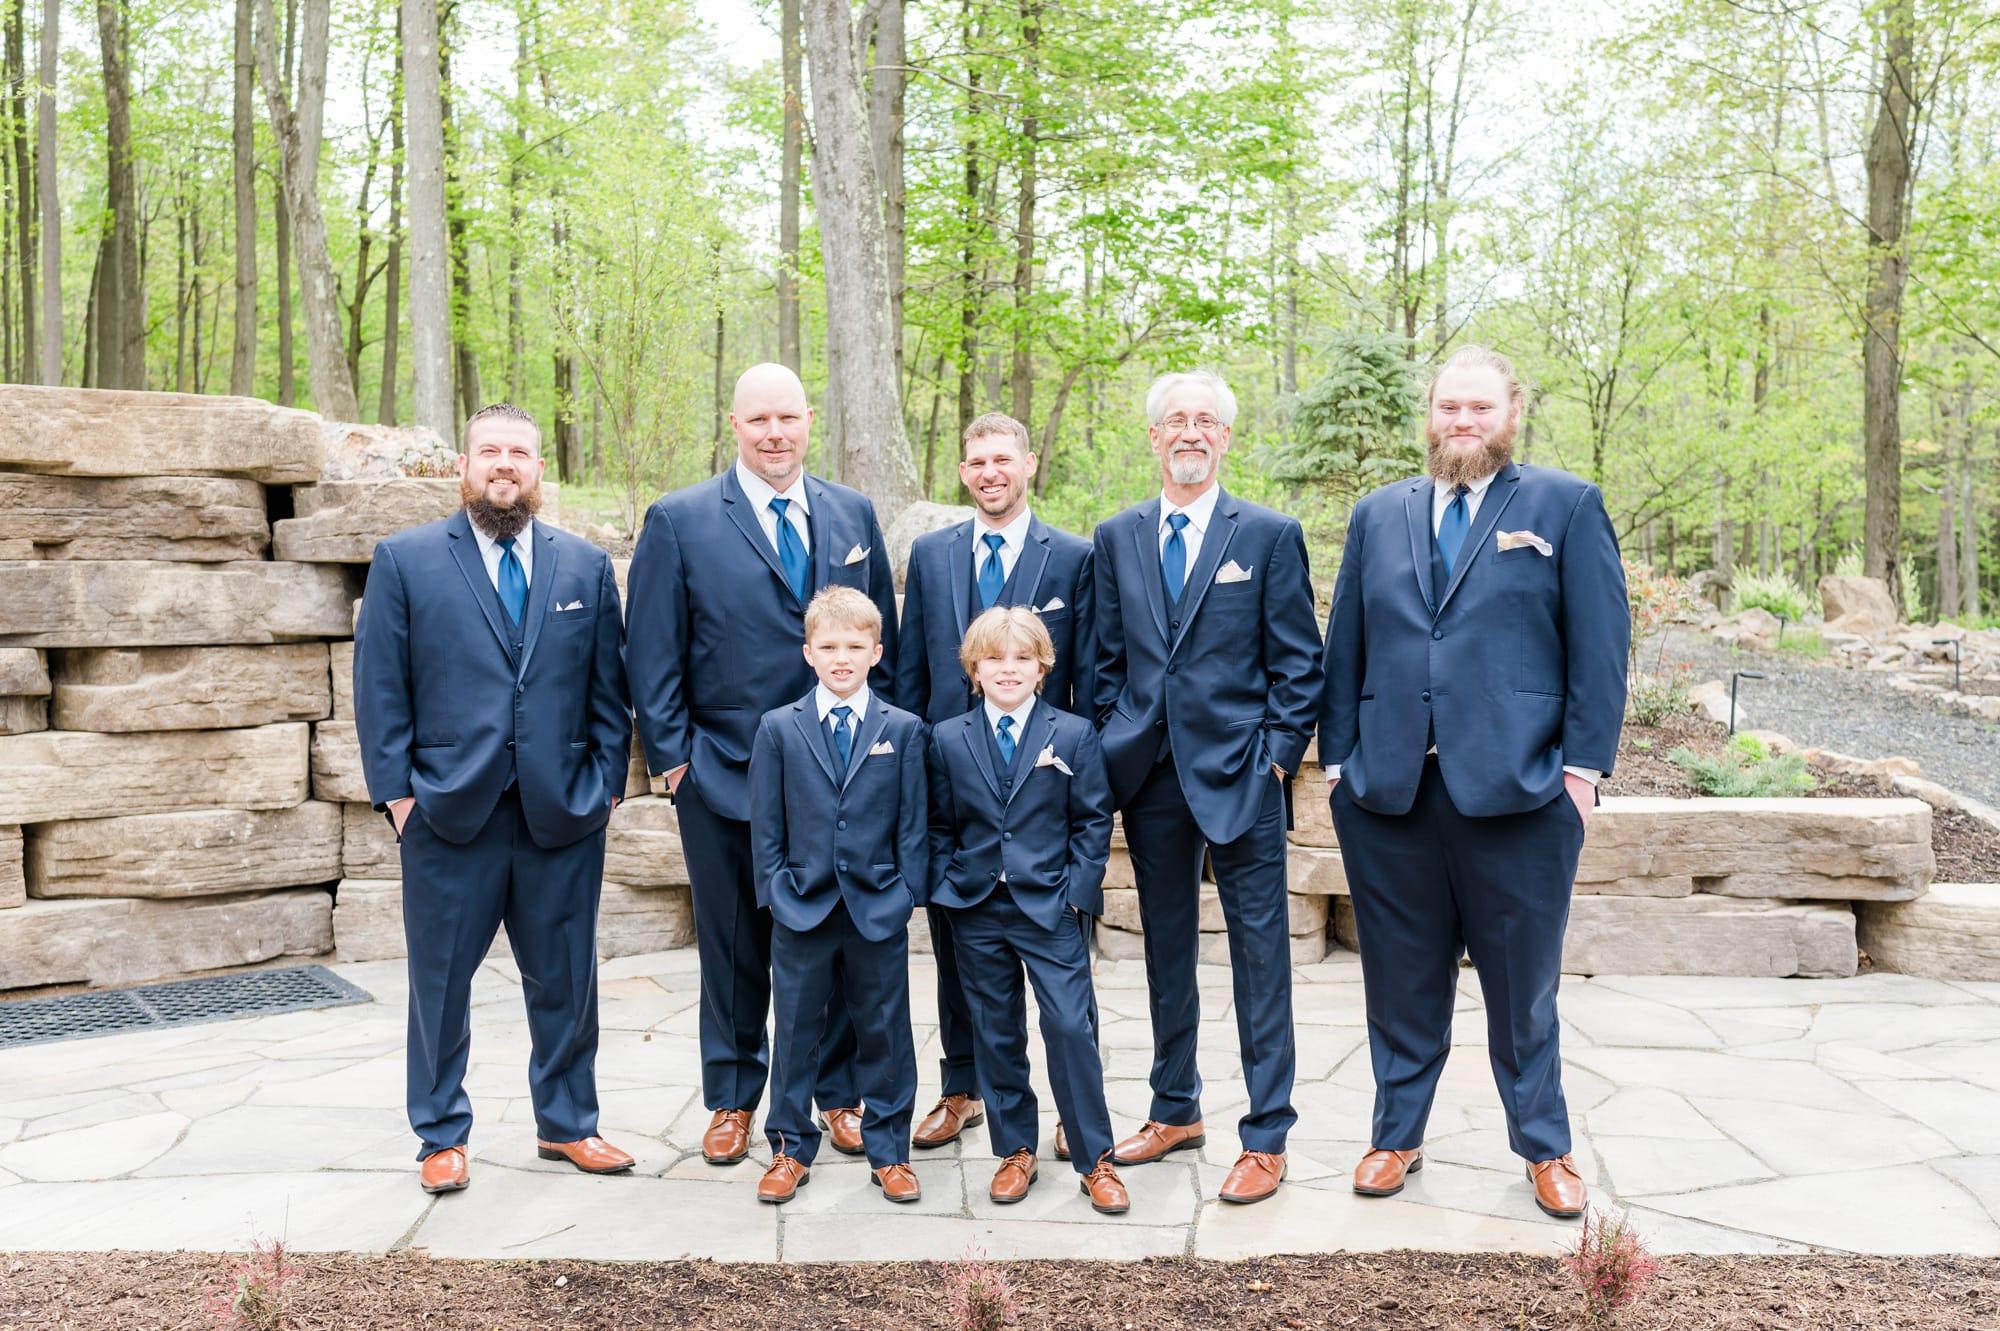 Bridal party portrait at Rolling Rails Lodge wedding